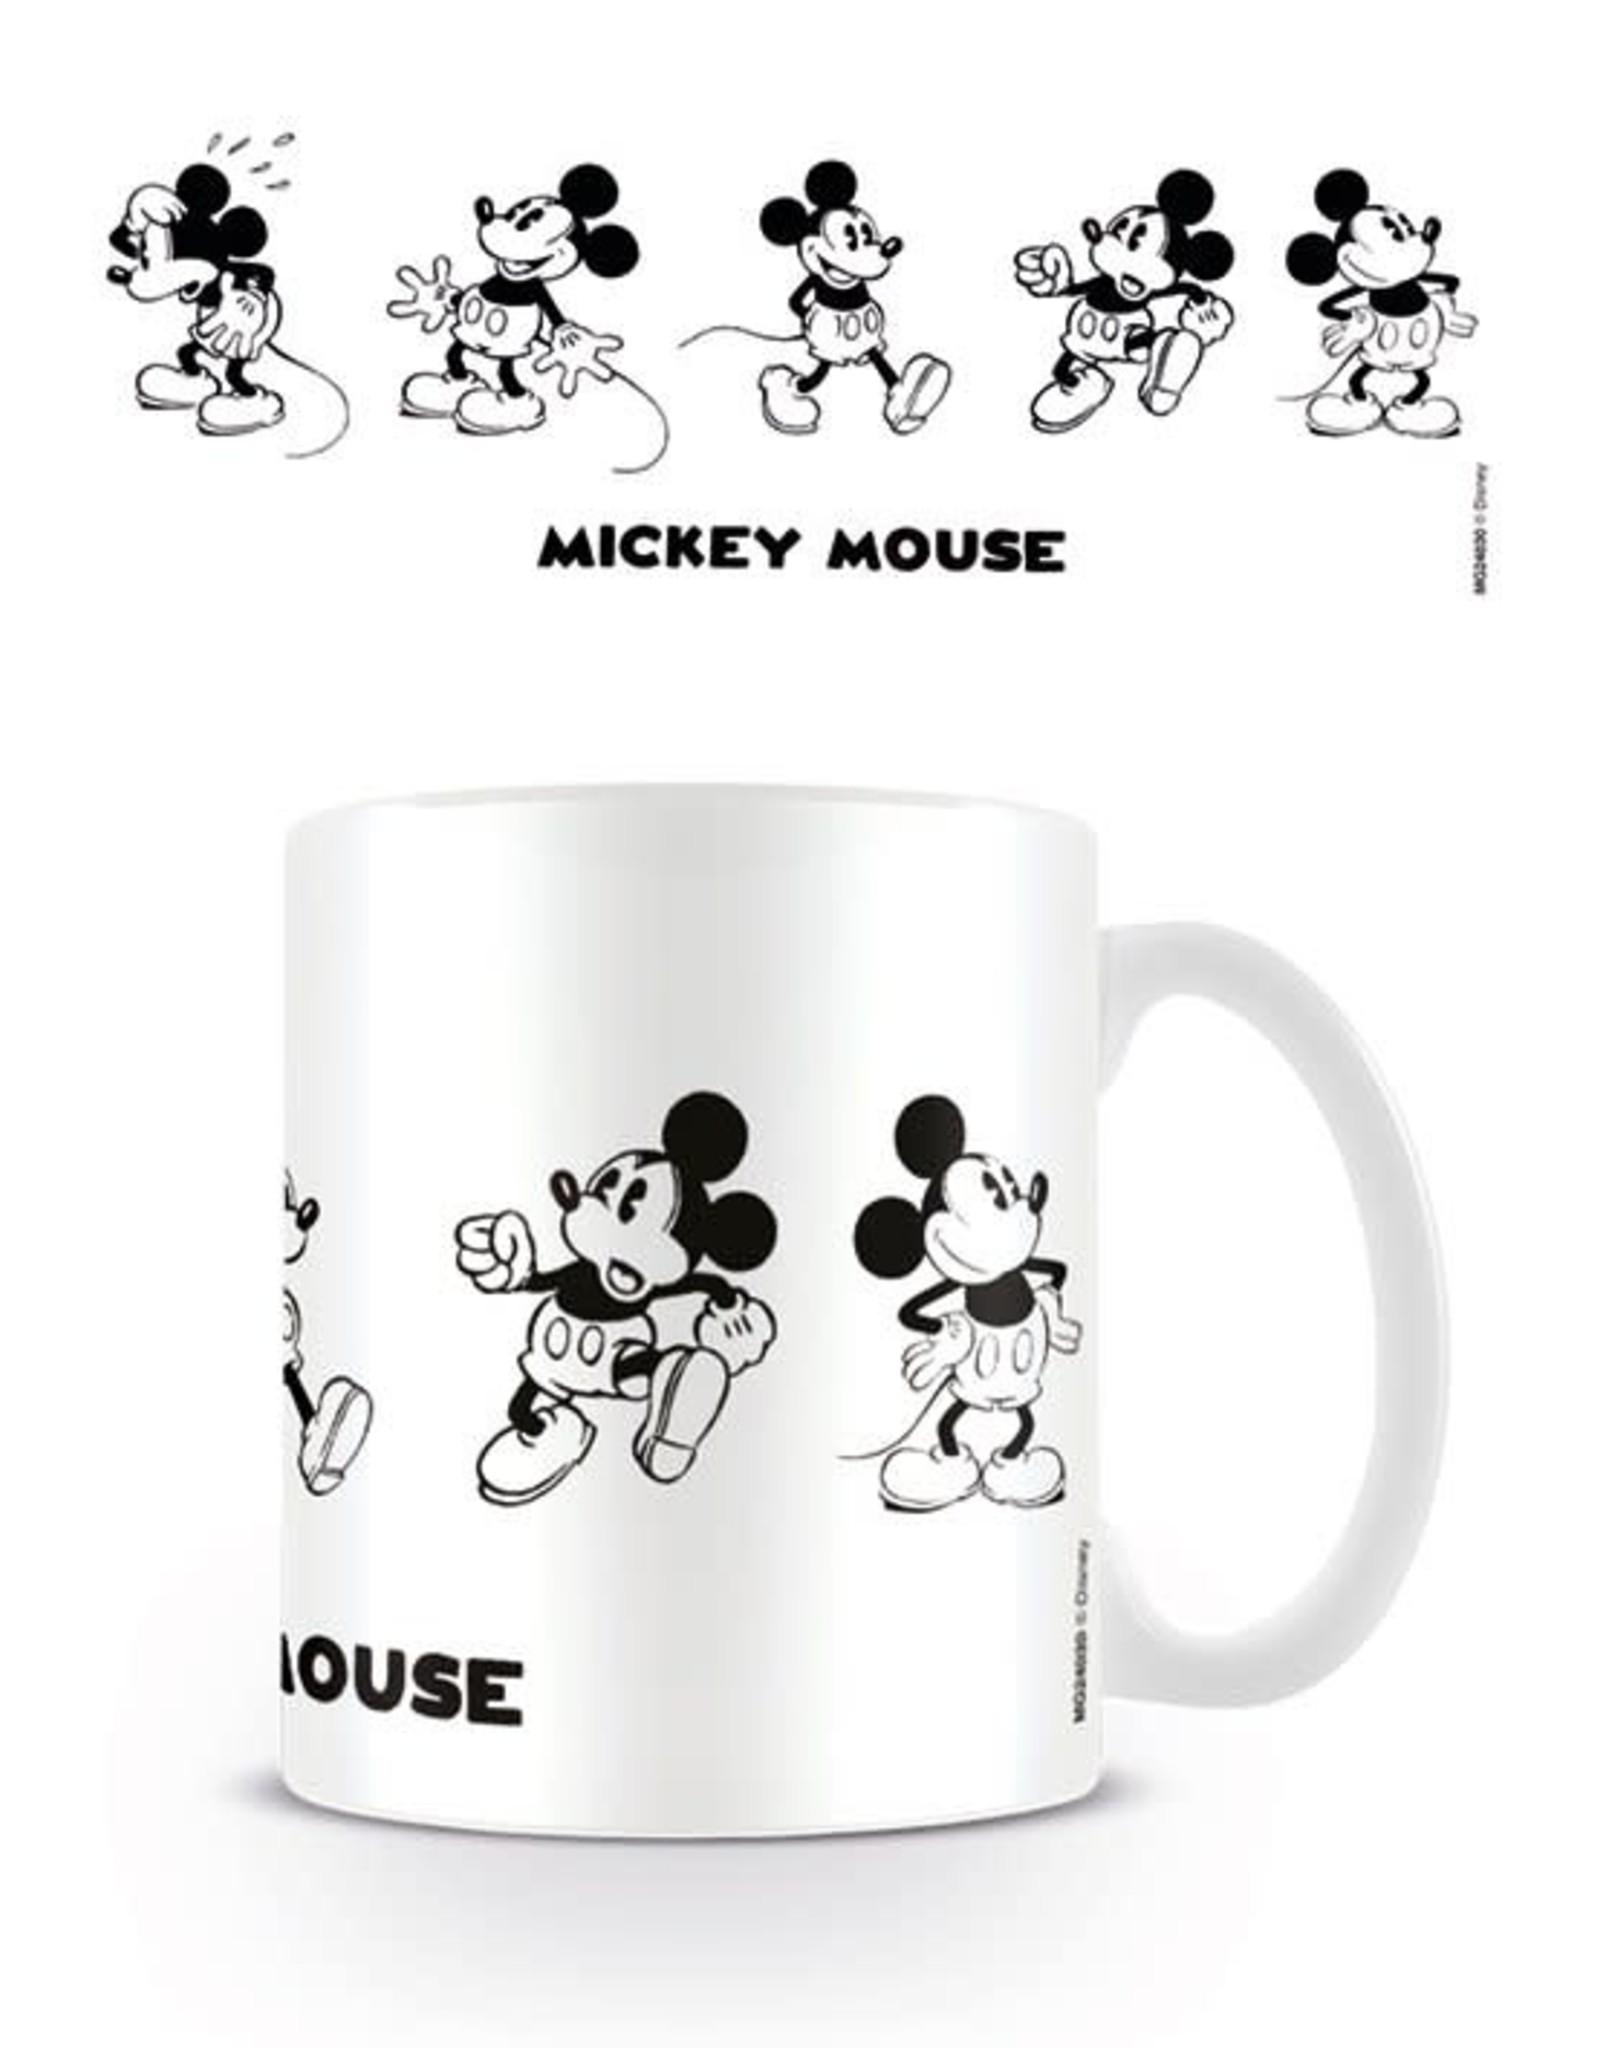 MICKEY MOUSE Vintage Mug 300 ml